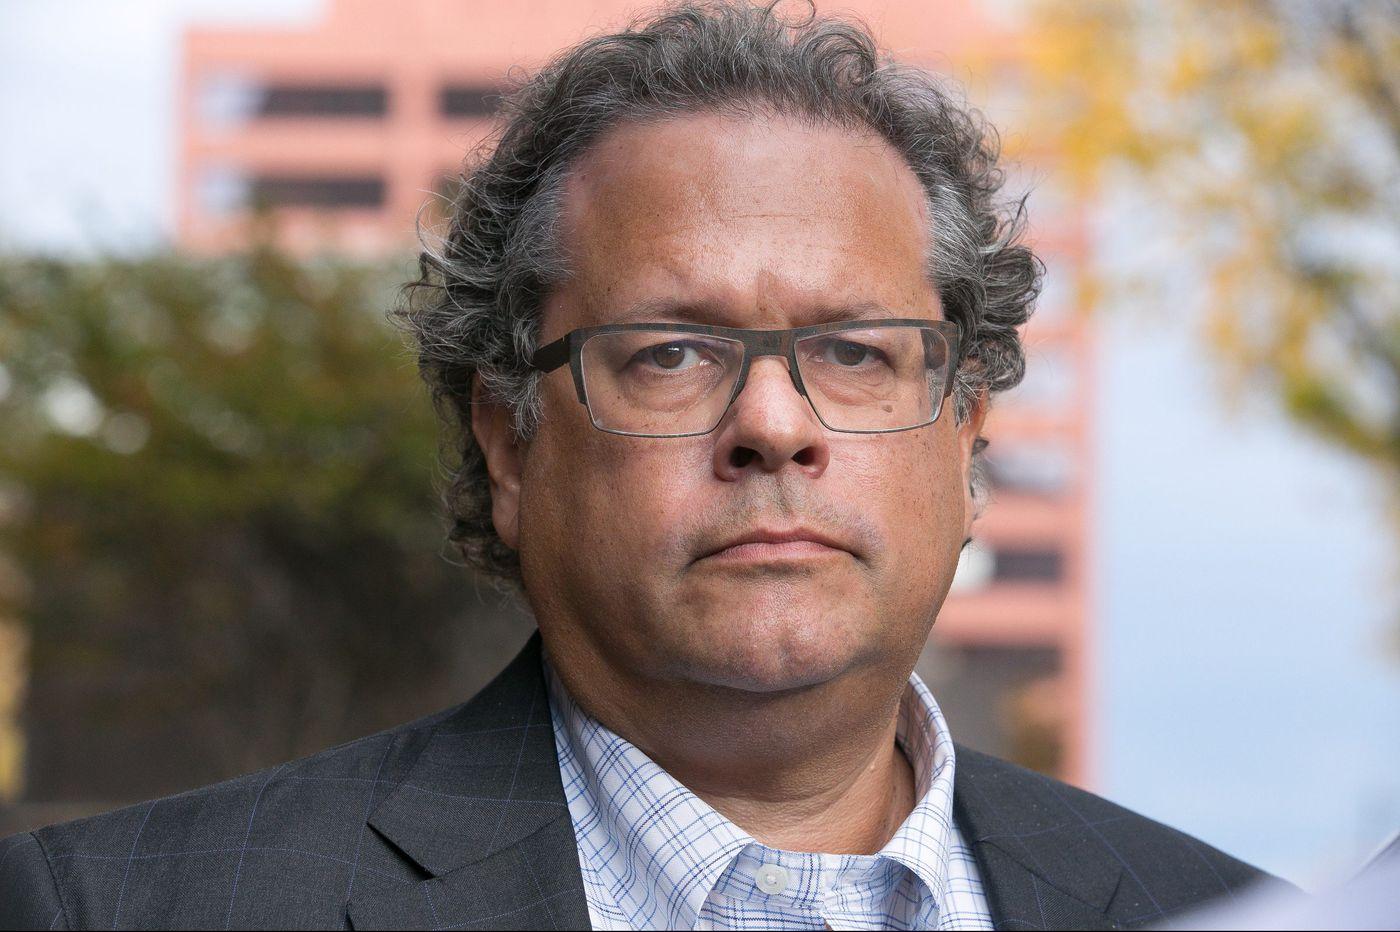 In testimony, Bob Brady aide punches back at prosecutors